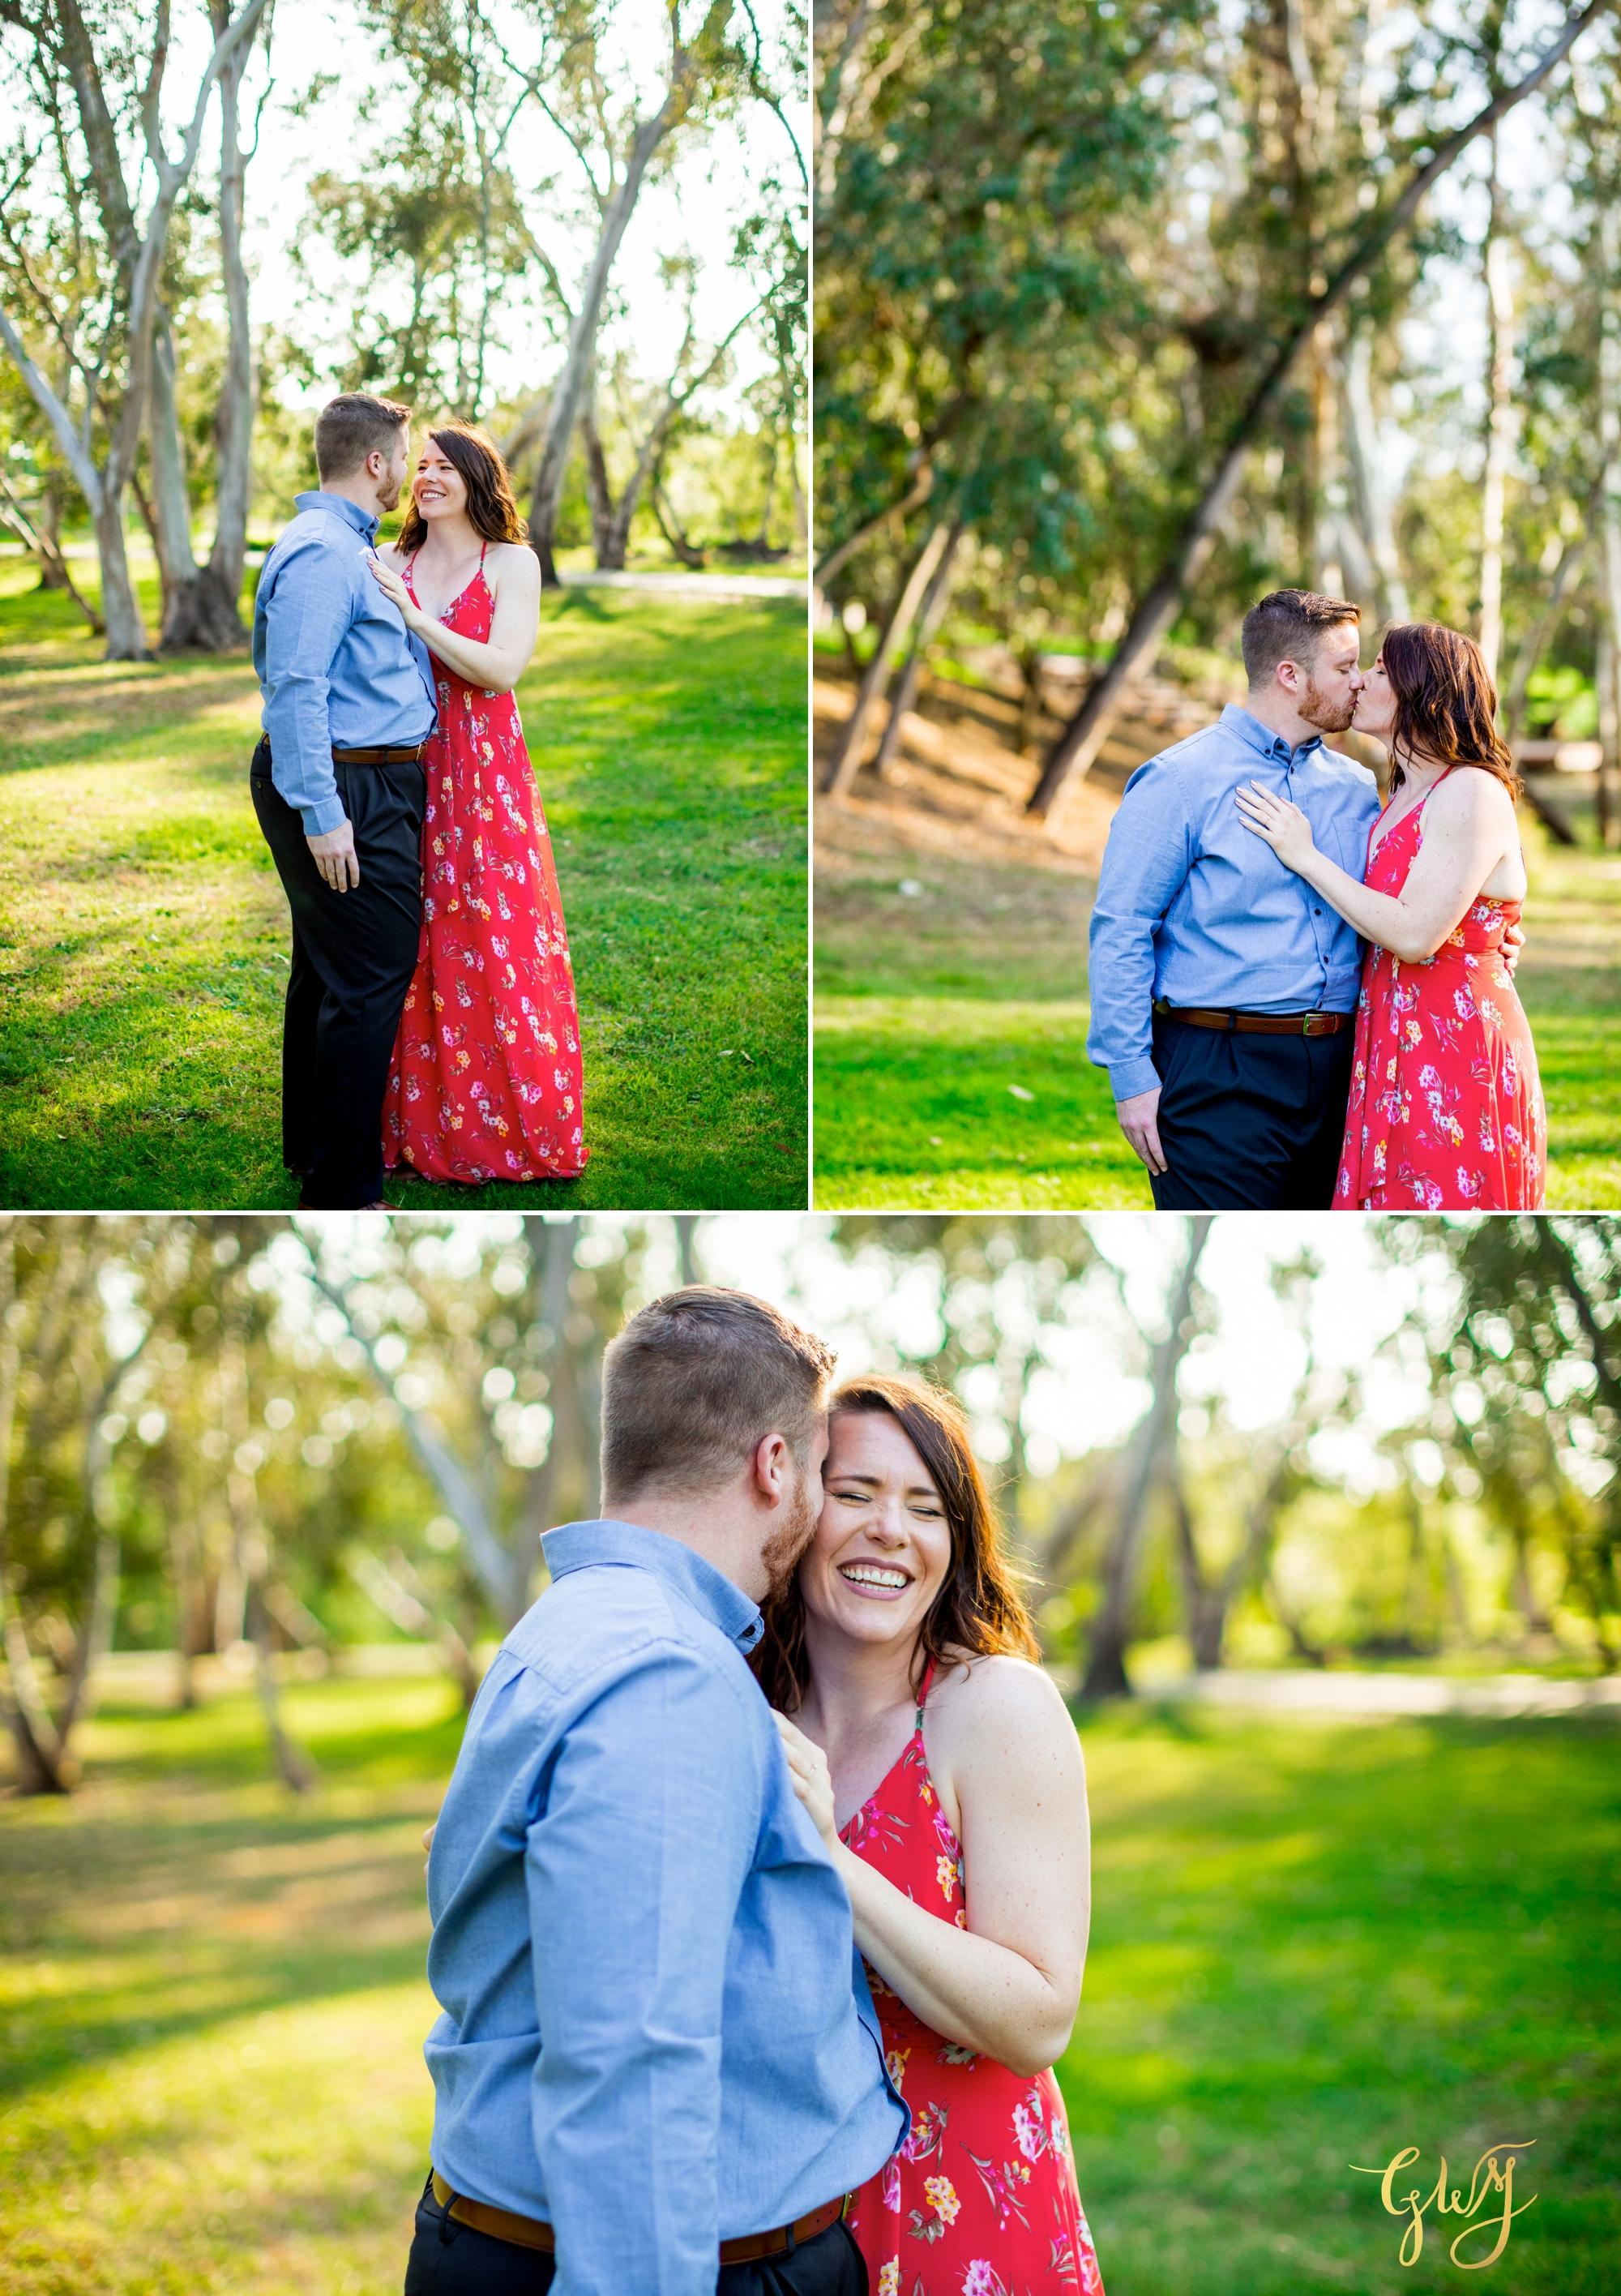 Cristina + David's Huntington Beach Central Park Romantic Sunset Engagement Session by Glass Woods Media 3.jpg